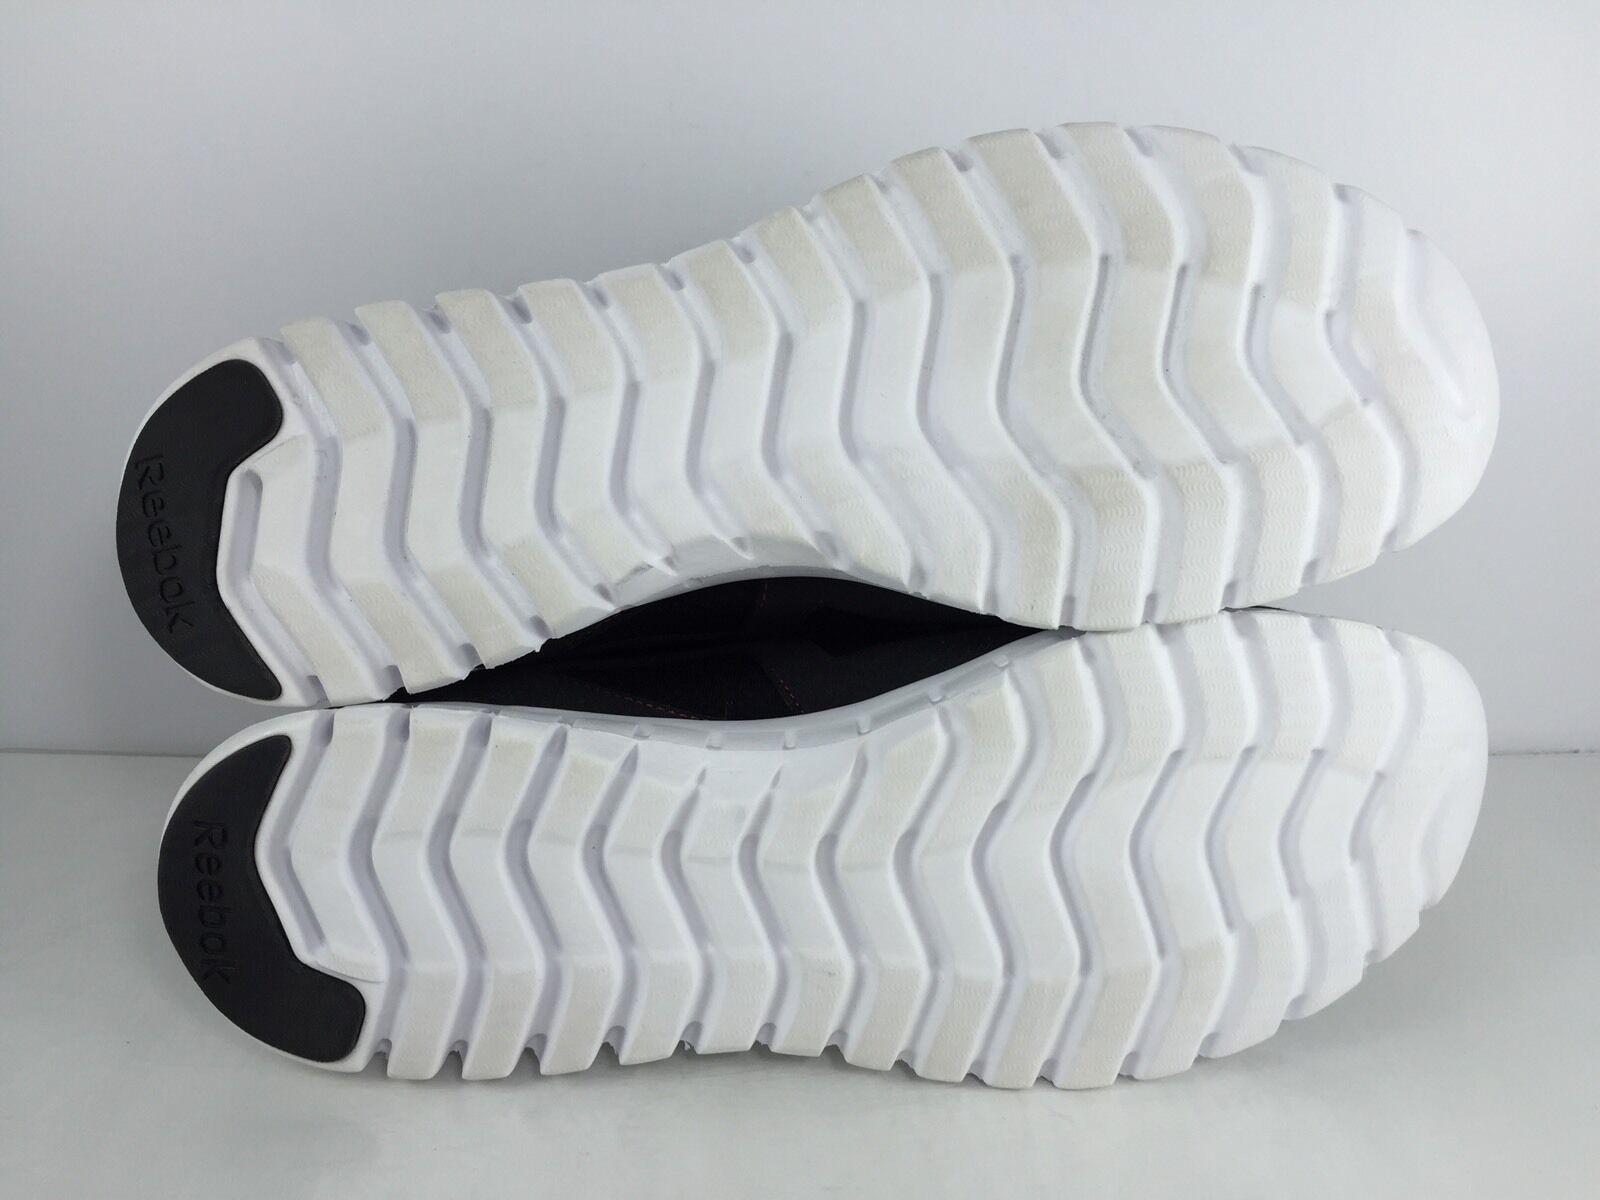 Ortholite ginnastica Uomo nera reebok scarpe da ginnastica Ortholite 13 3fe5e1